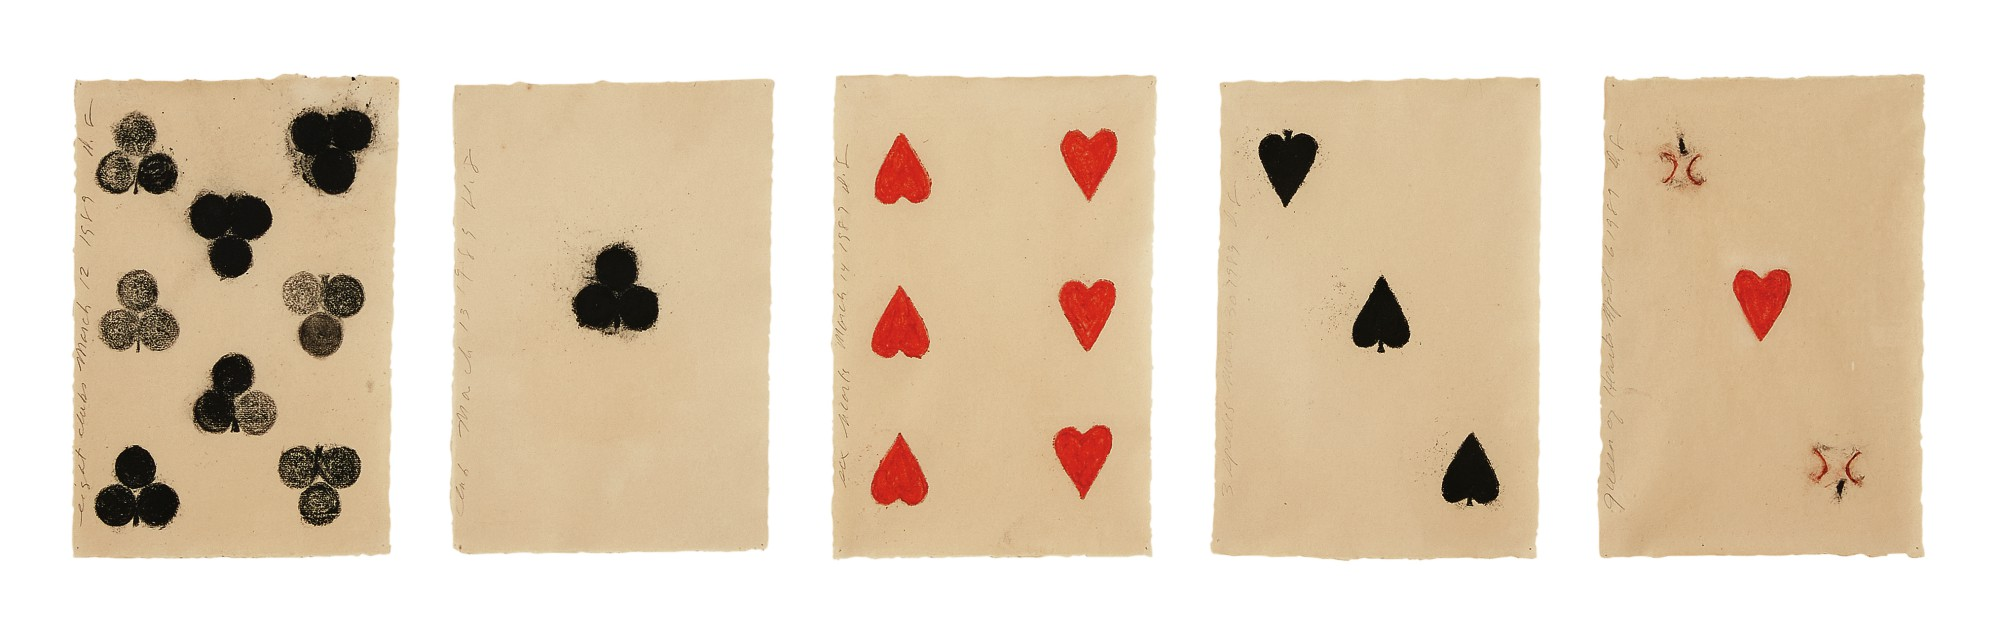 DONALD SULTAN   i. Eight Clubs ii. Club iii. Six Hearts iv. Three Spades v. Queen of Hearts